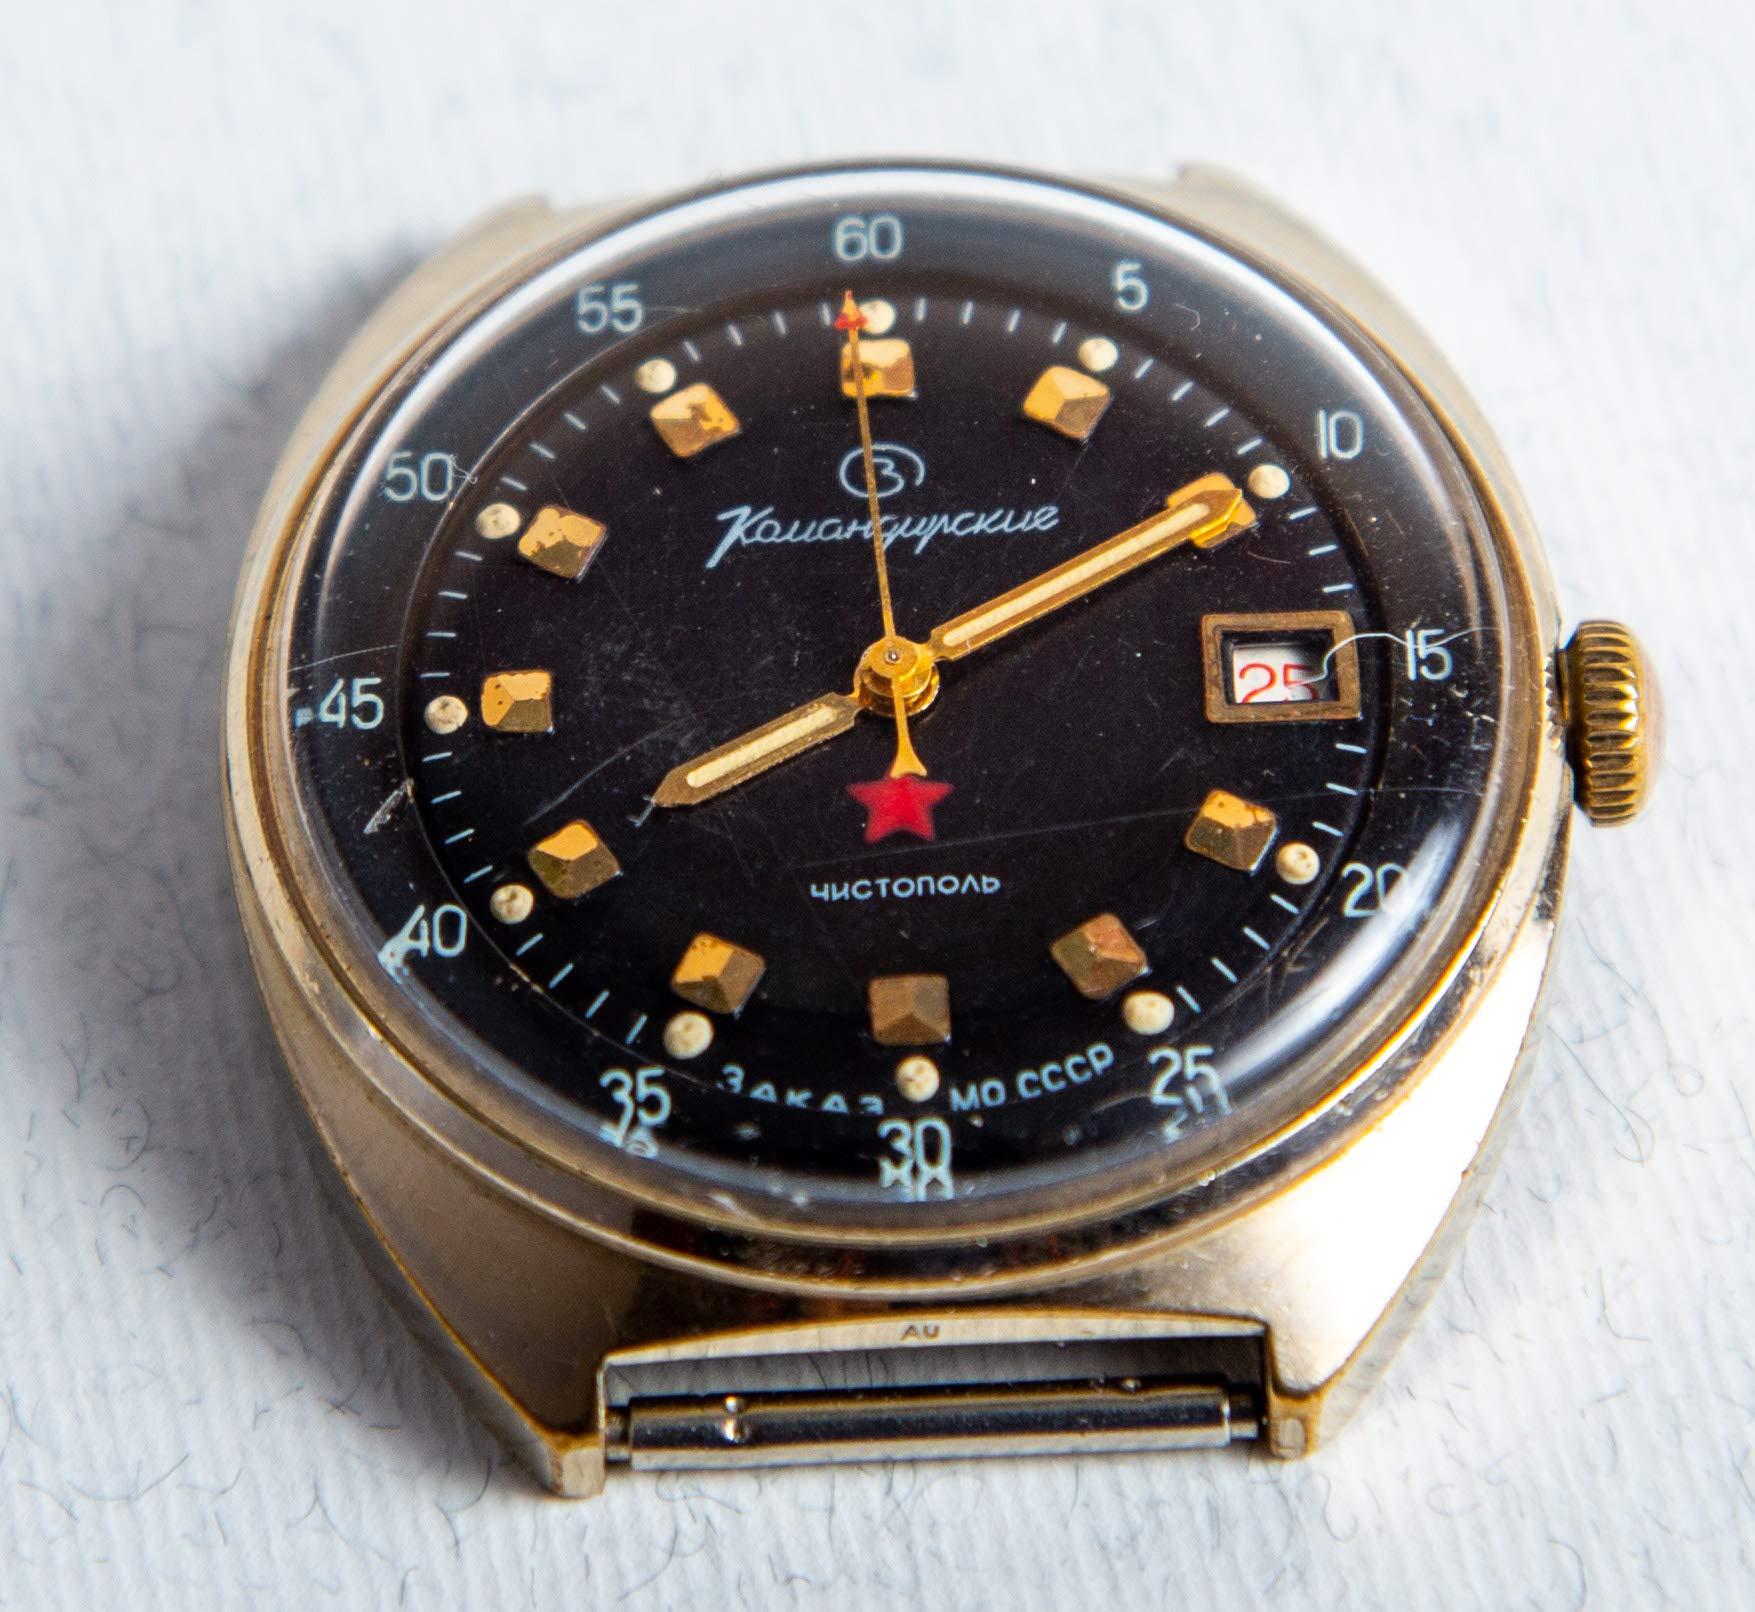 1970s Vintage USSR Watch vostok komandirskie Military Russian Commander Заказ МО Komandirskiye Golden Color Red Star by Wostok (Image #6)